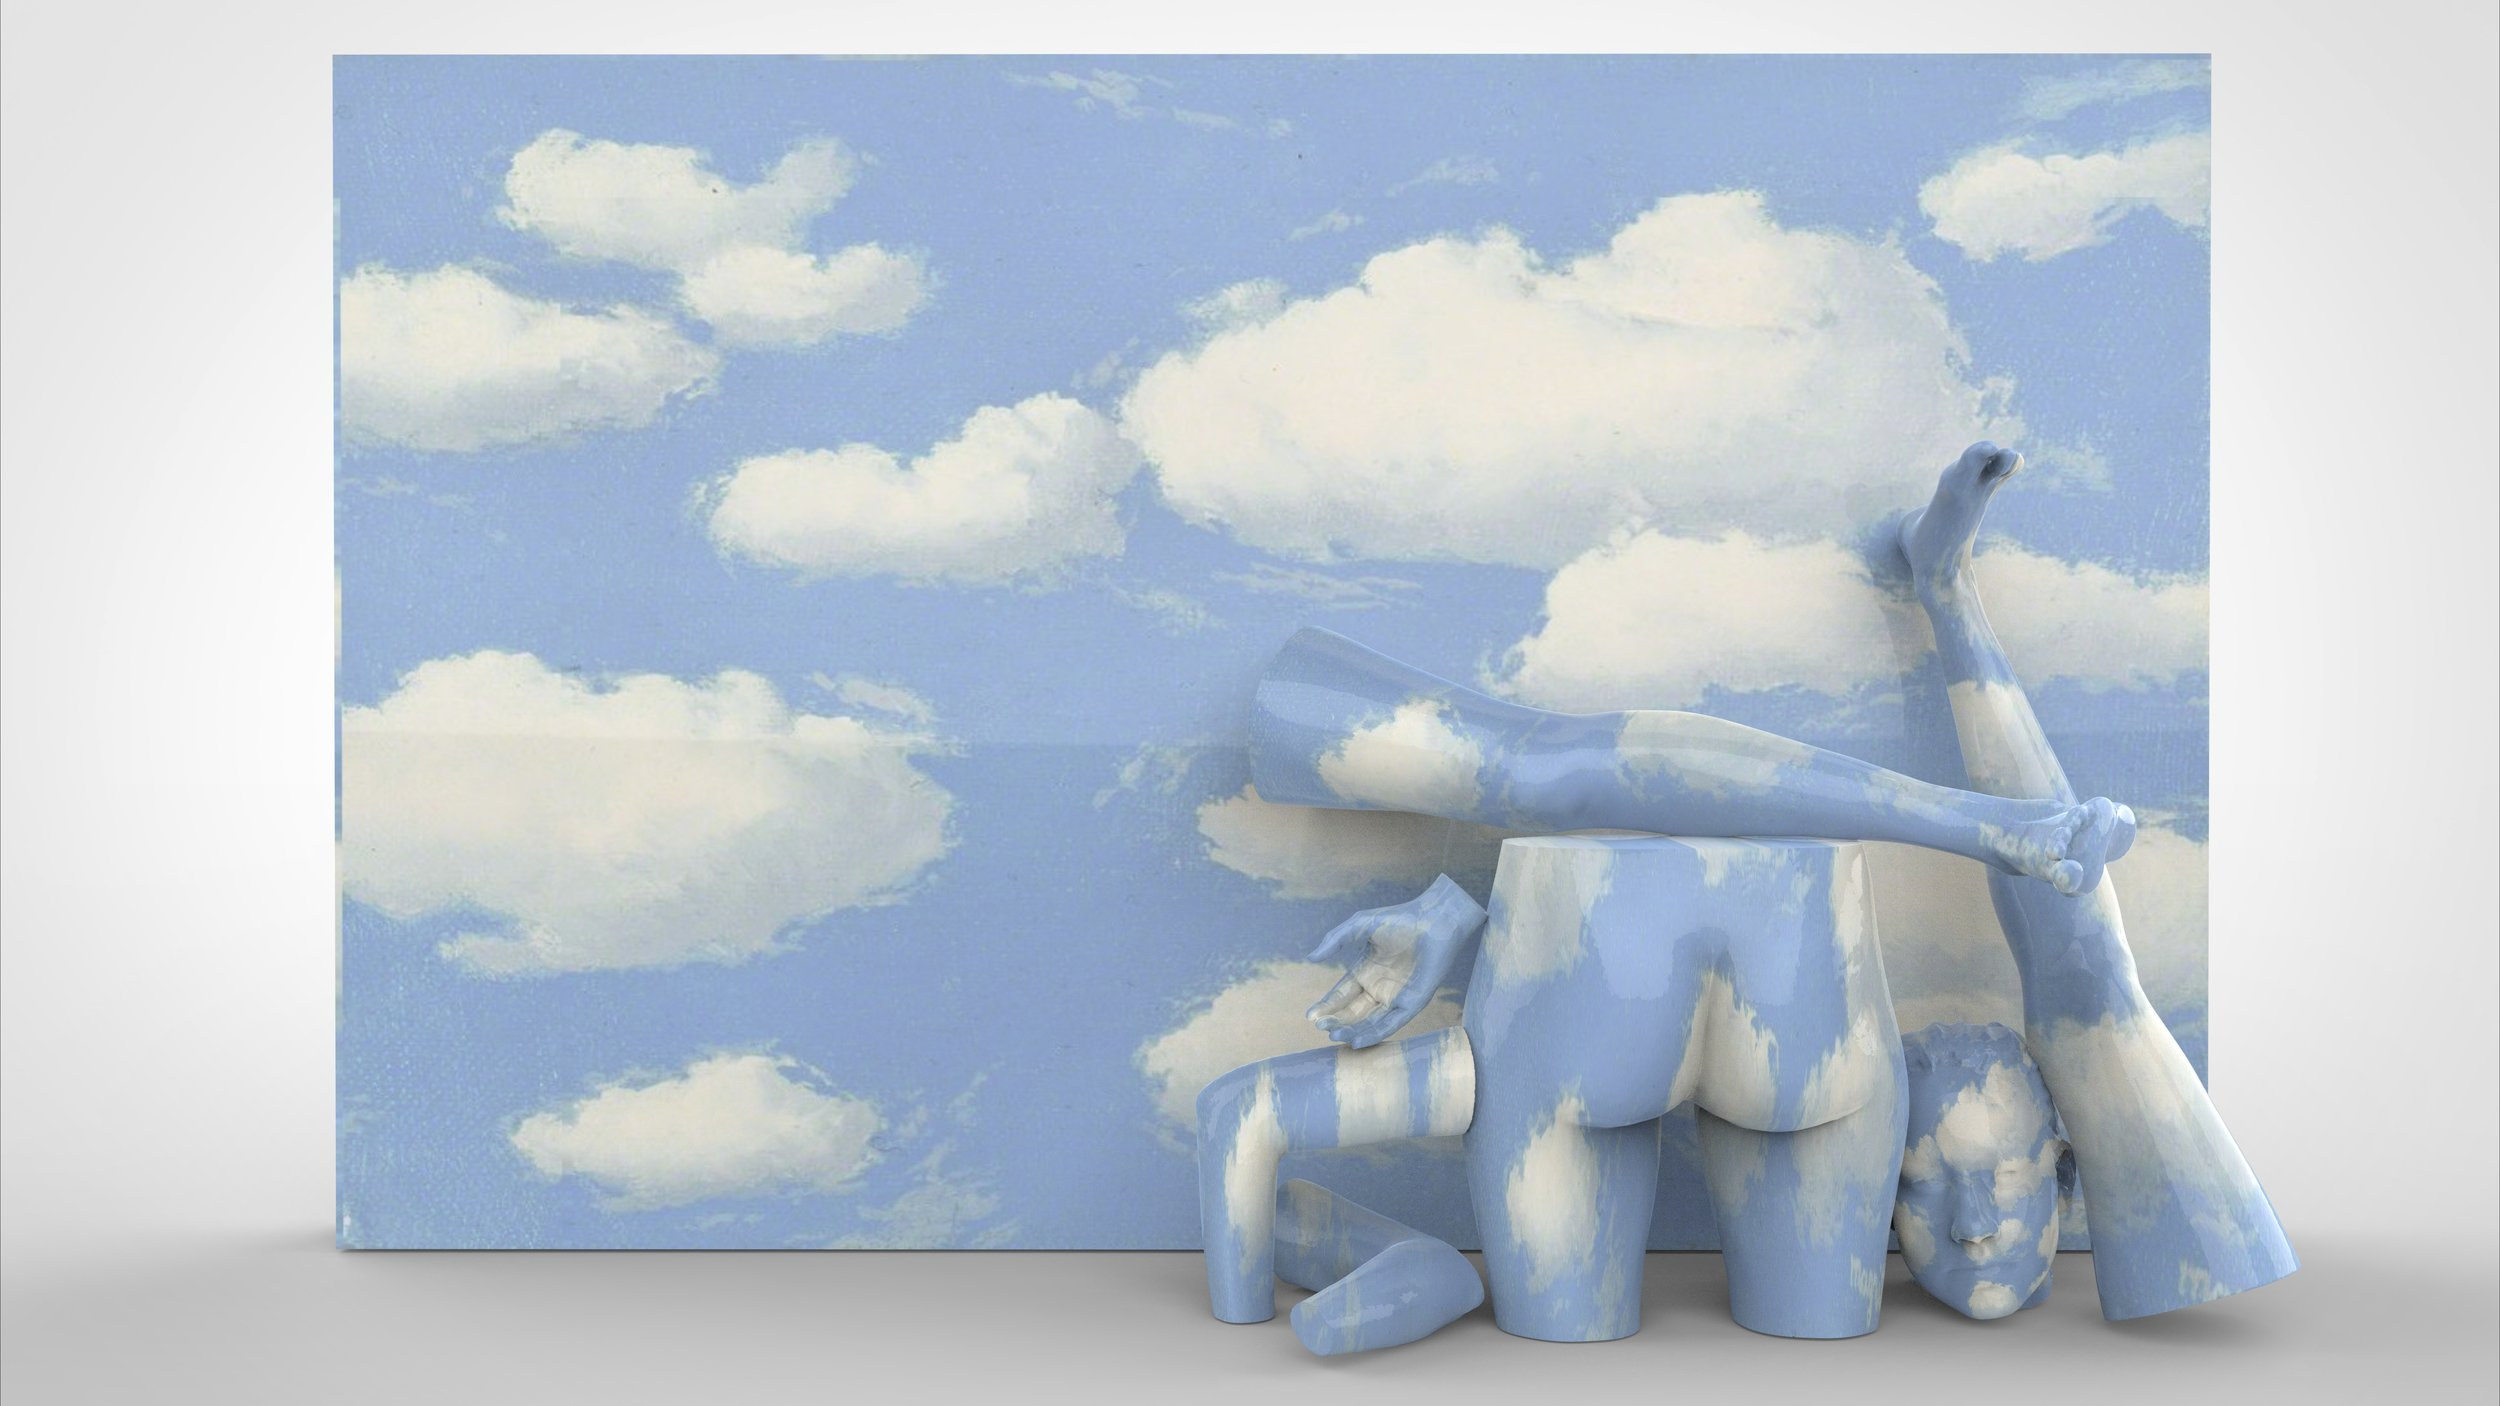 magritte_render_1.3 (2).jpg